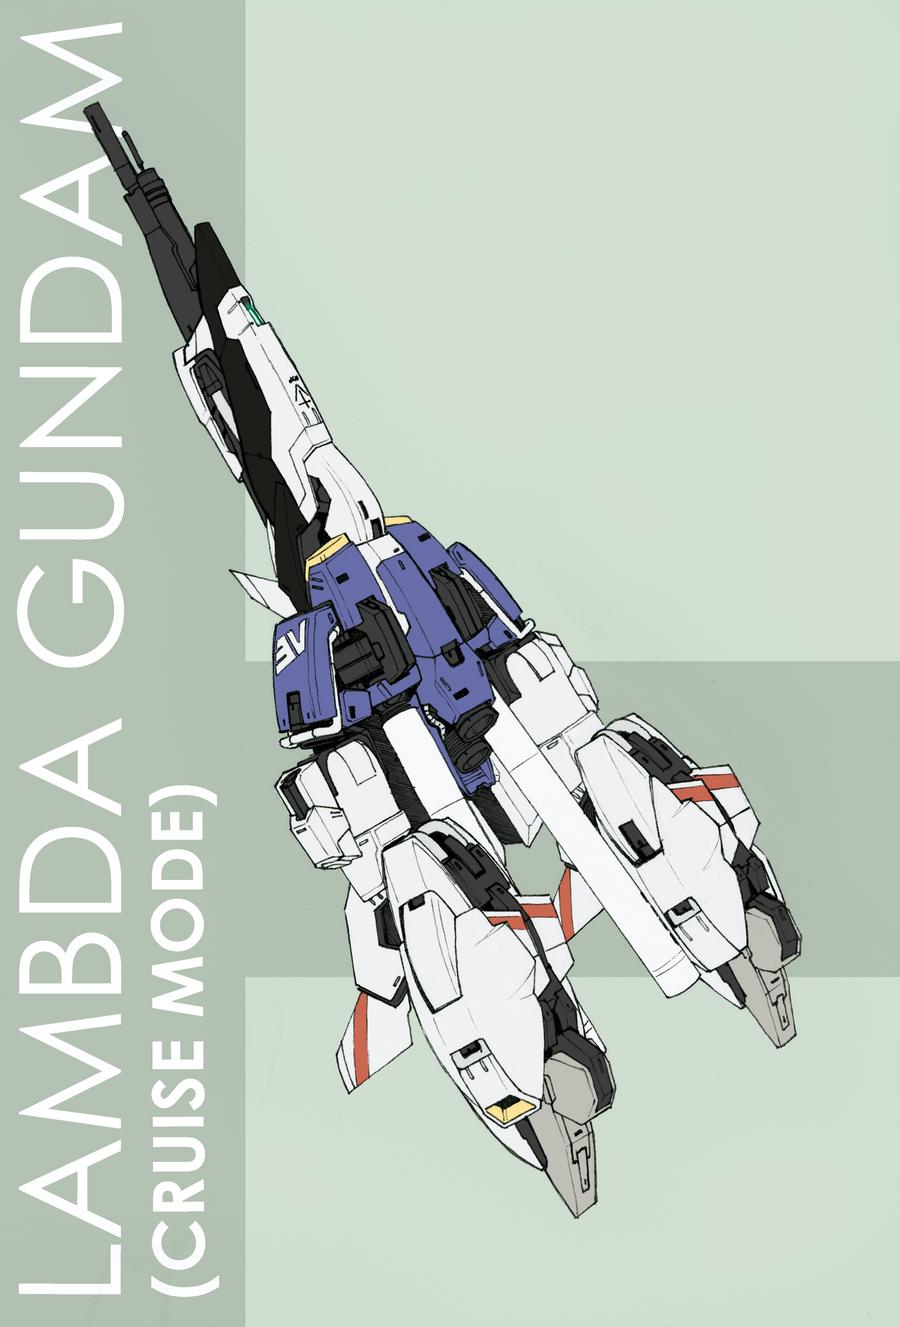 Lambda Gundam - Cruise Mode by Tekka-Croe